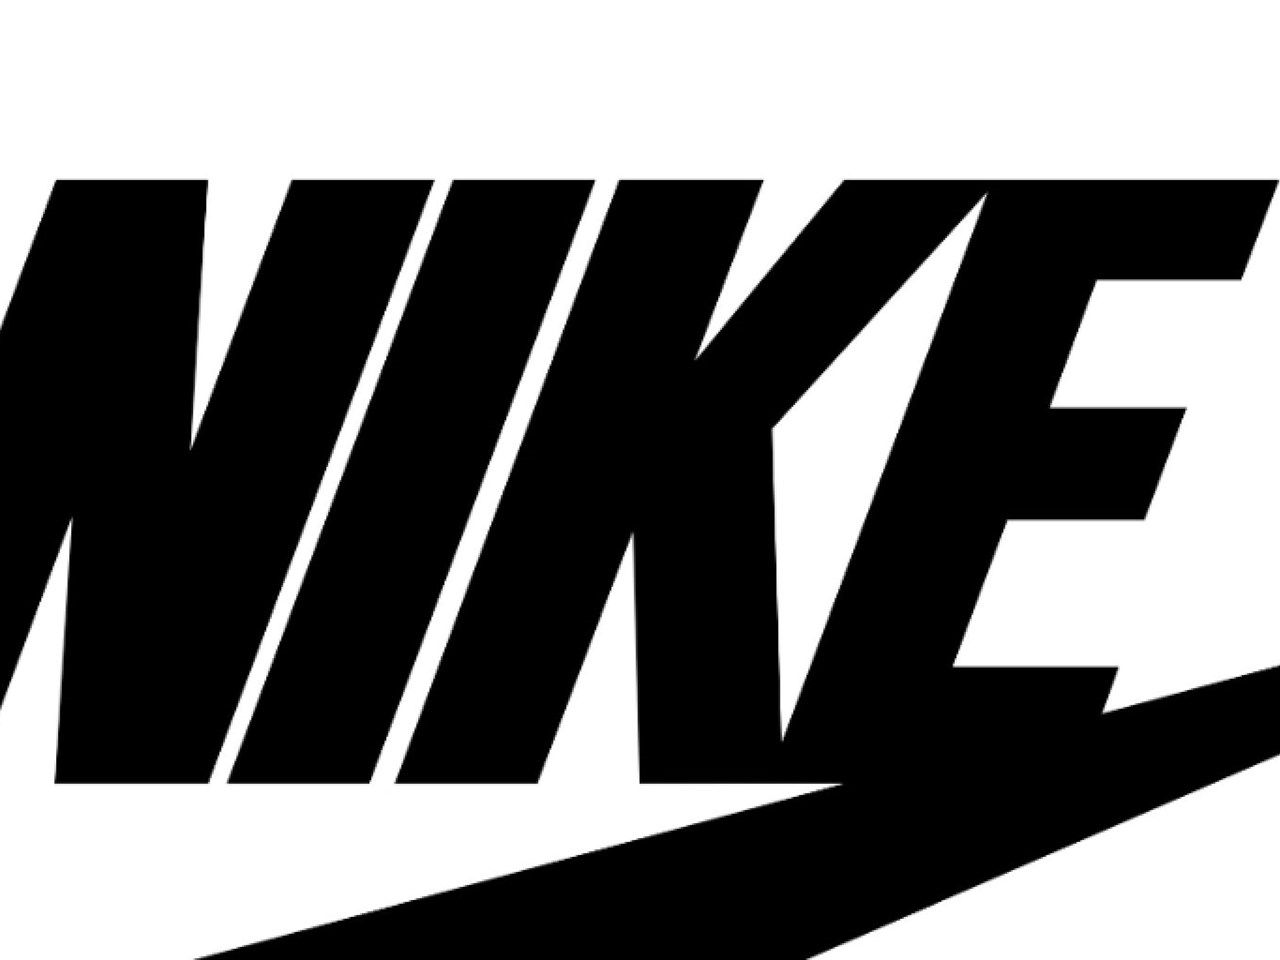 Nike Black And White Wallpapers Top Free Nike Black And White Backgrounds Wallpaperaccess